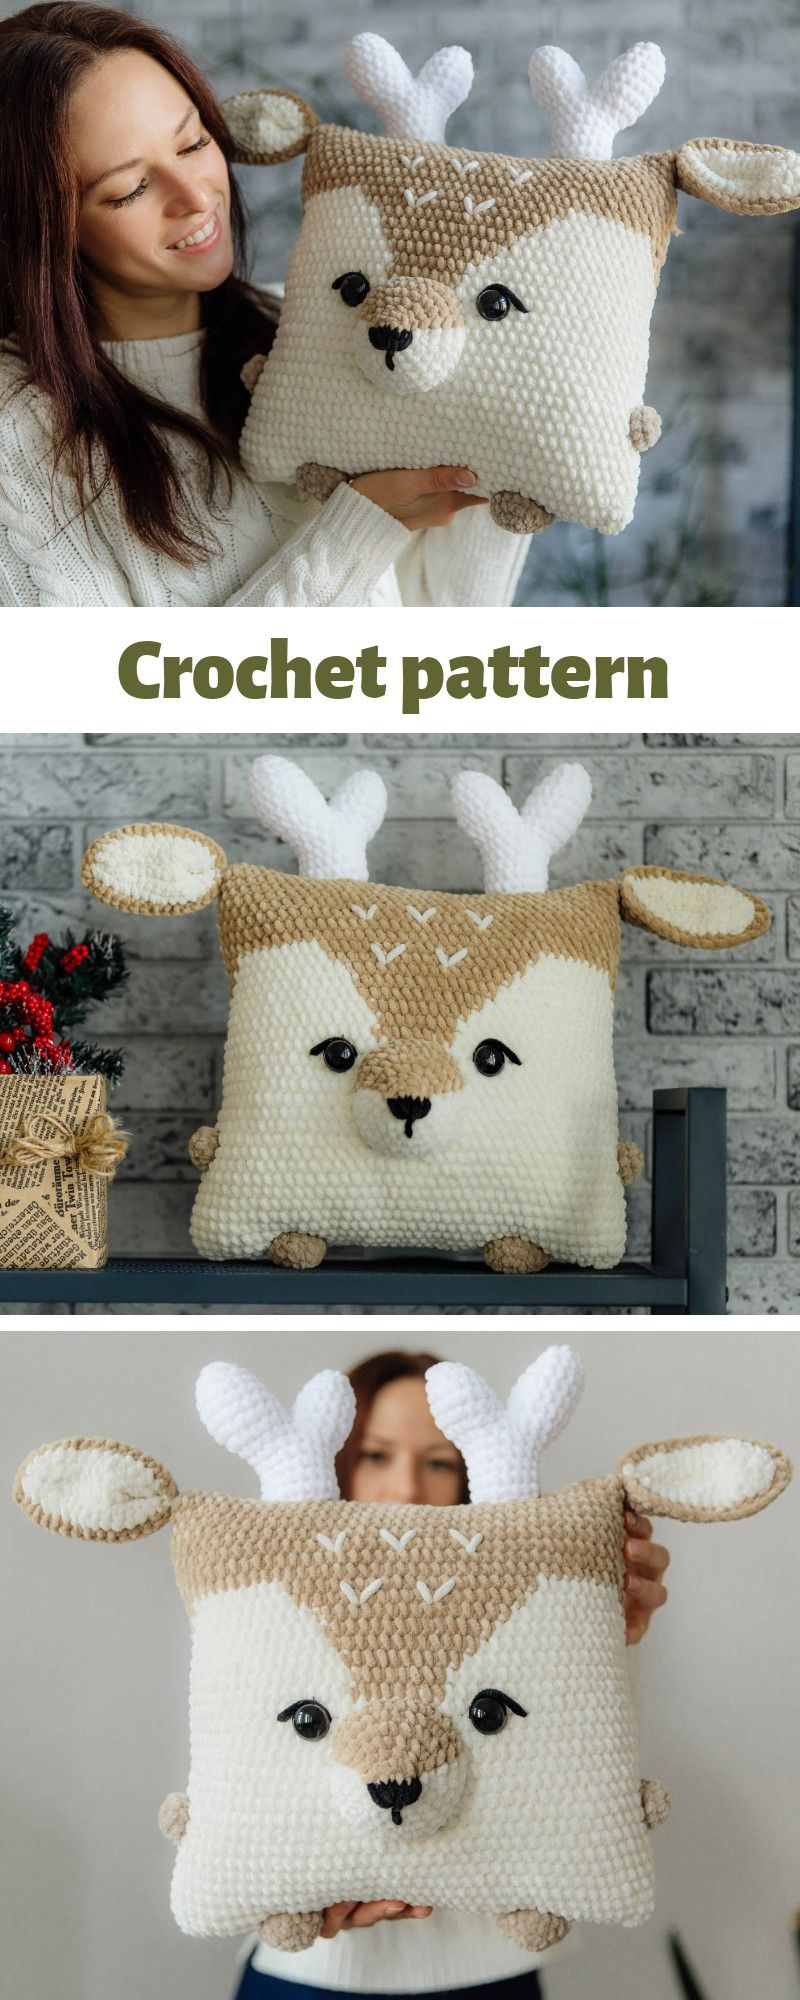 Crochet pattern raindeer, crochet deer pattern, crochet christmas deer, crochet pillow pattern, deer